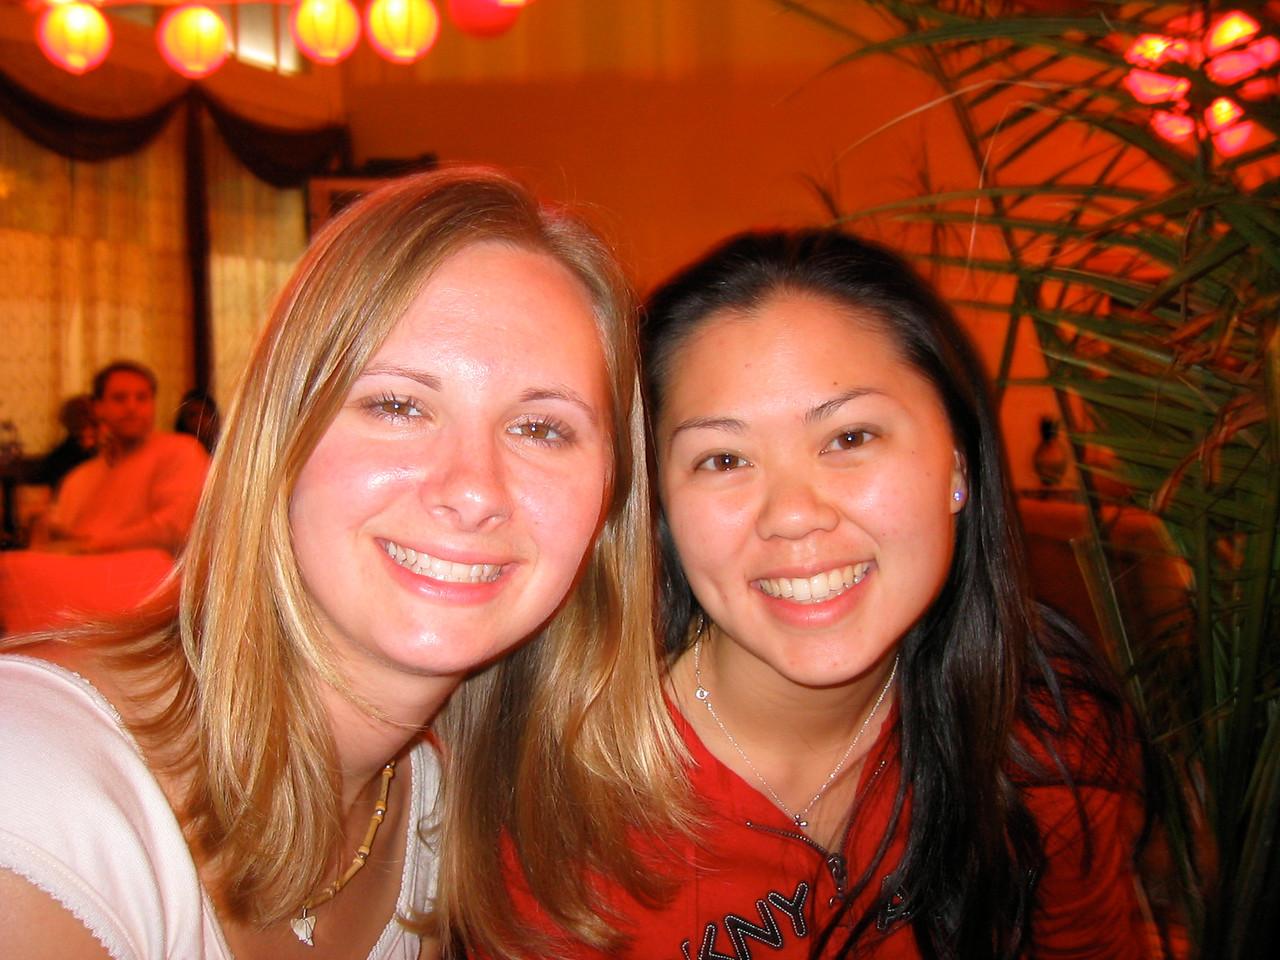 2004 05 15 Saturday - @ Everett & Jones back room jazz - Melody & Tiffany 2